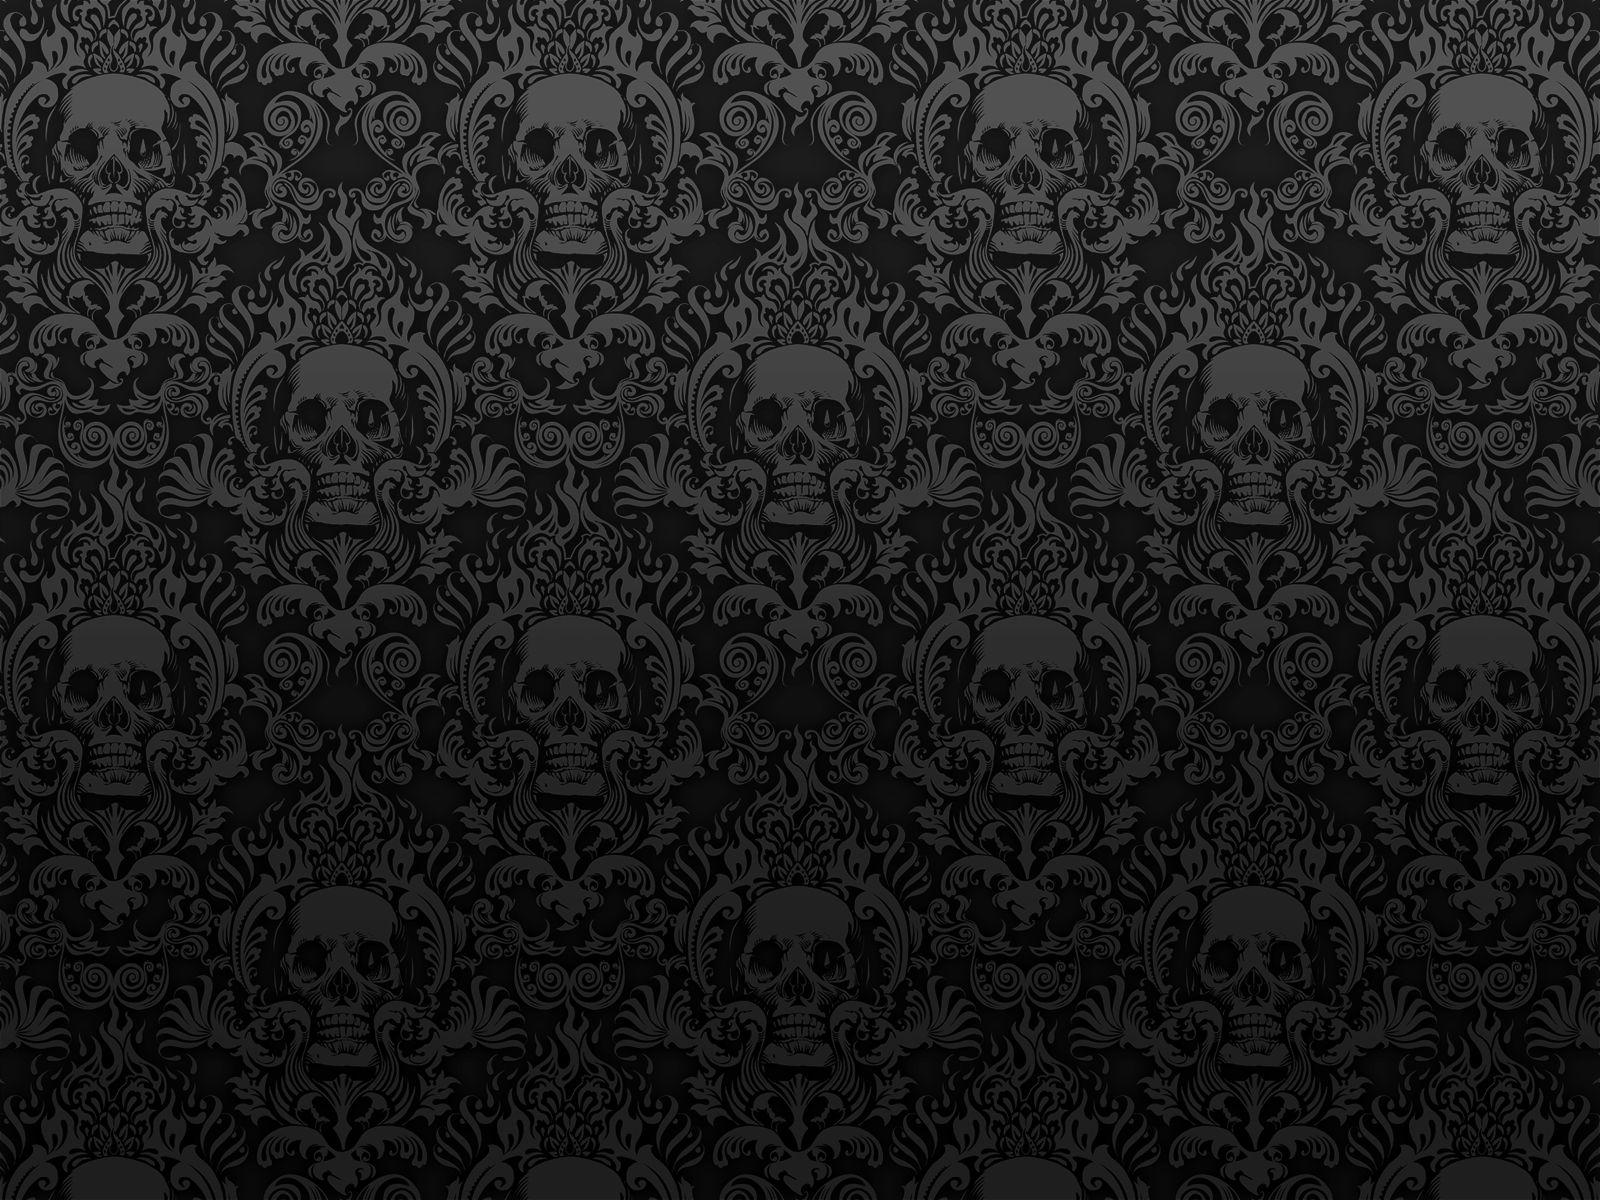 Damask Wallpaper Skull Black Dark Photoshop Photography Misc